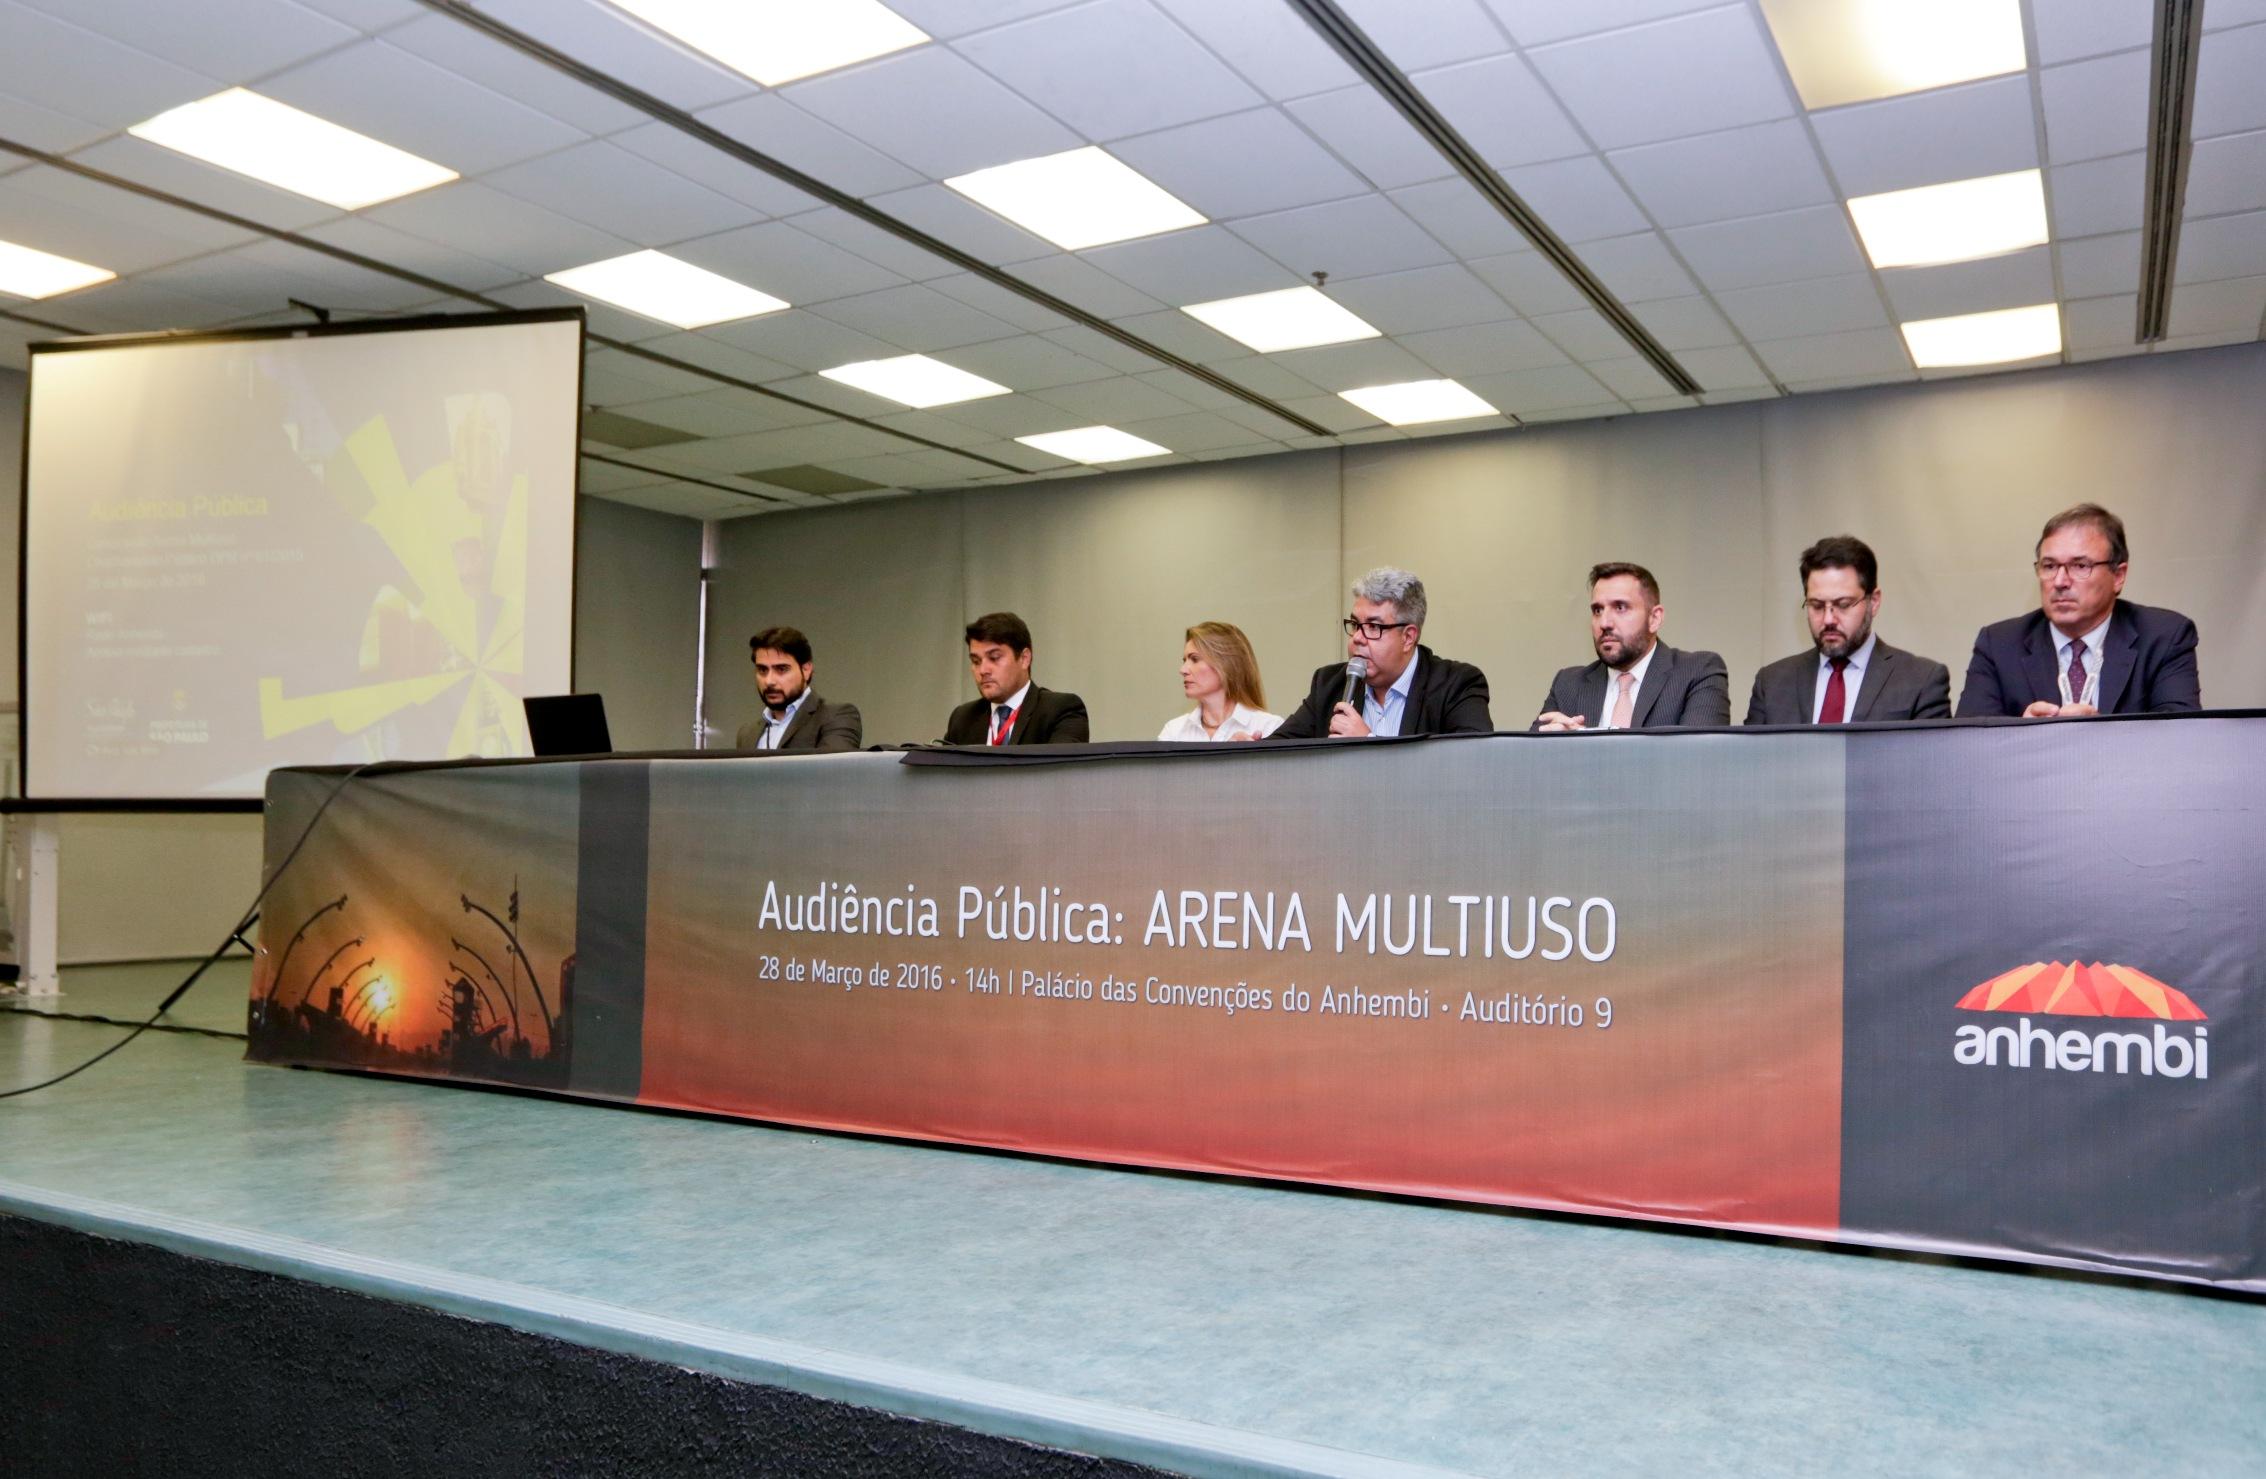 Arena Multiuso - audiência pública. Foto: José Cordeiro/SPTuris